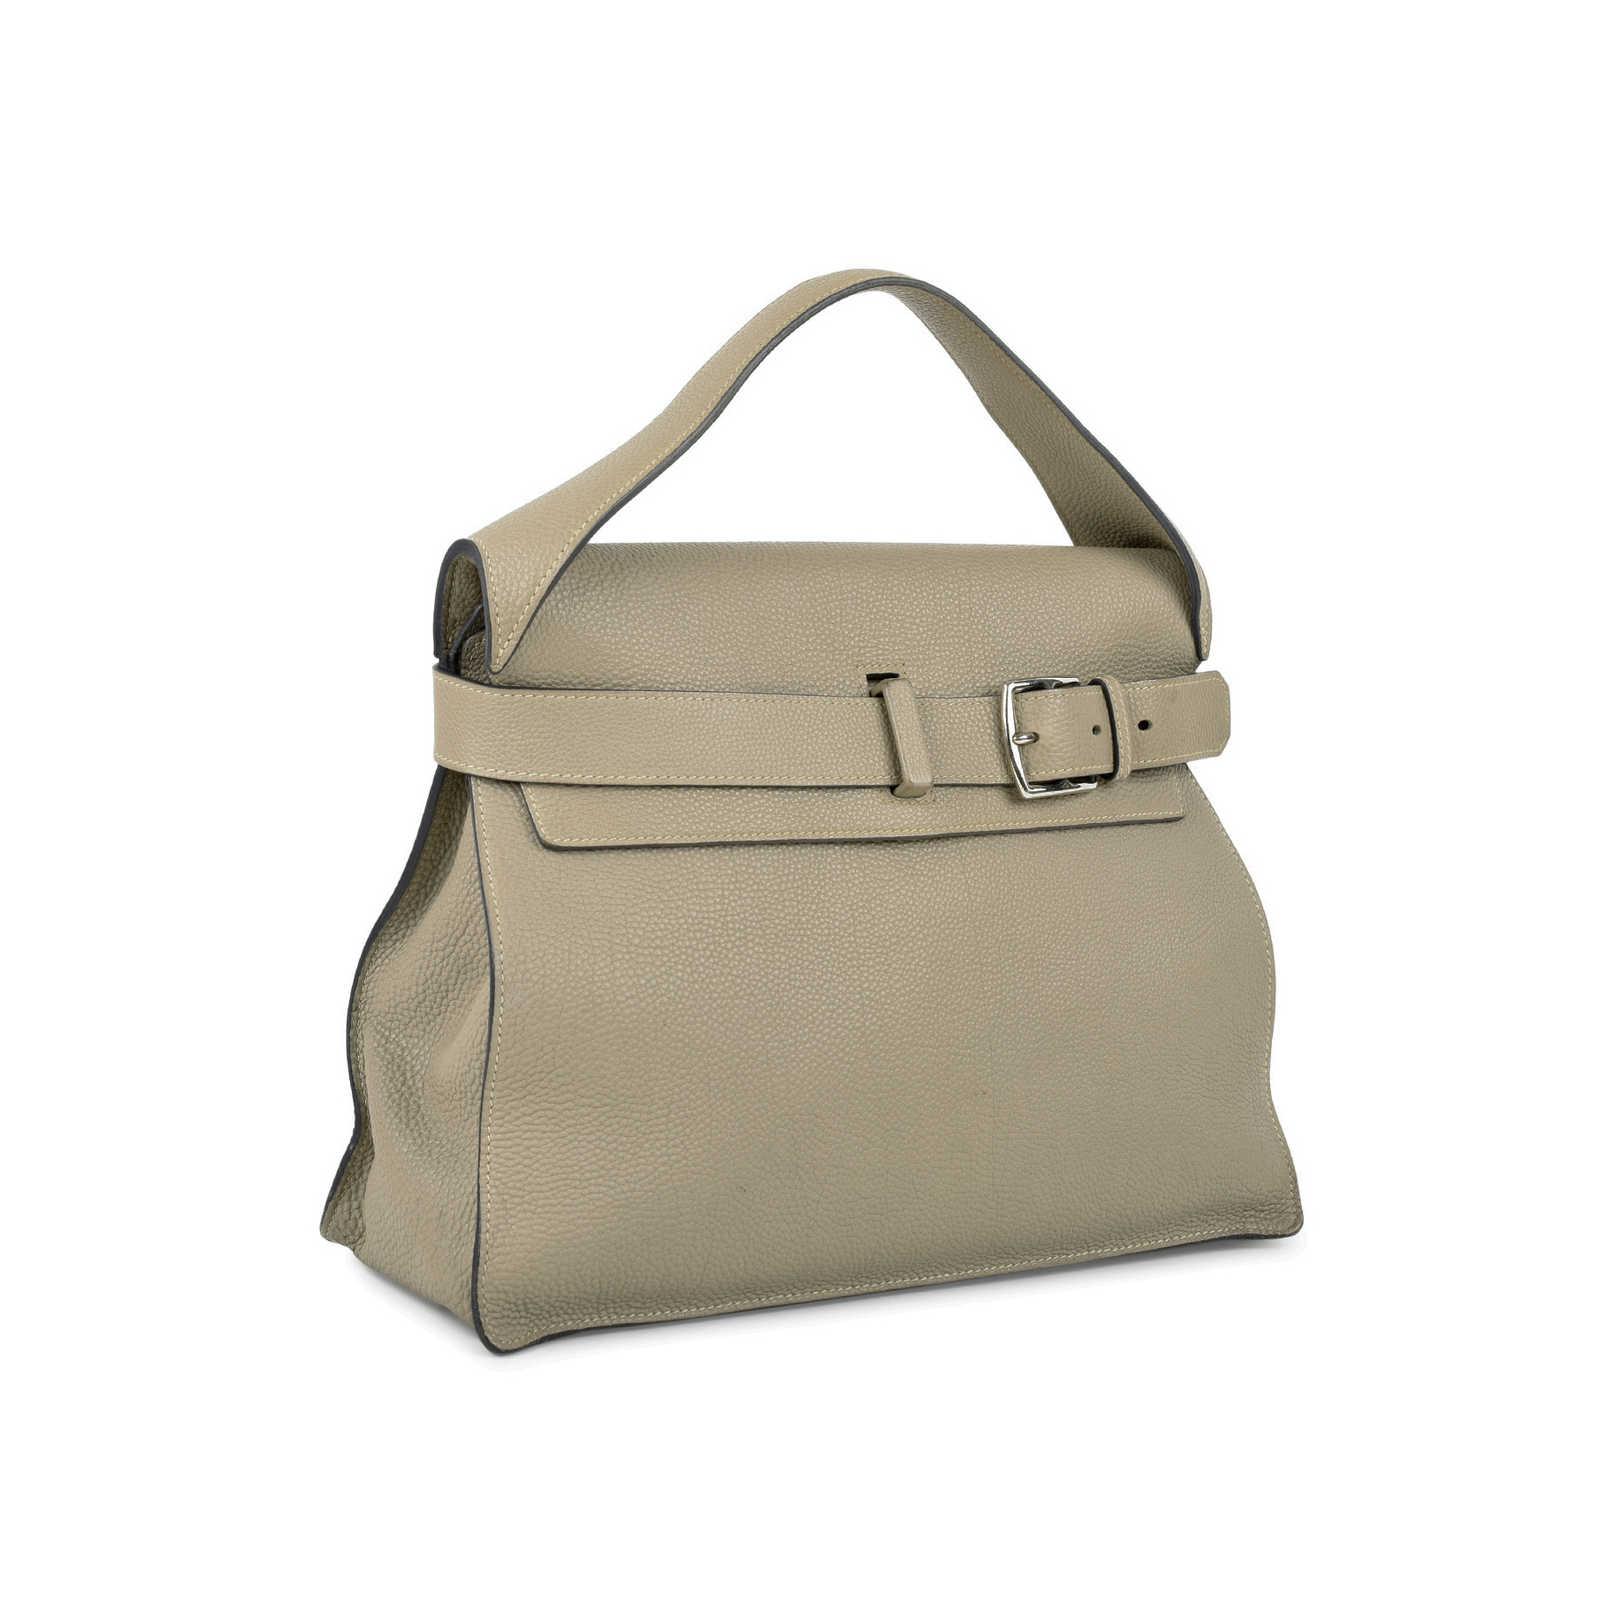 e86bc6e340 ... Authentic Second Hand Hermès Etoupe Etribelt Bag (PSS-473-00061) -  Thumbnail ...